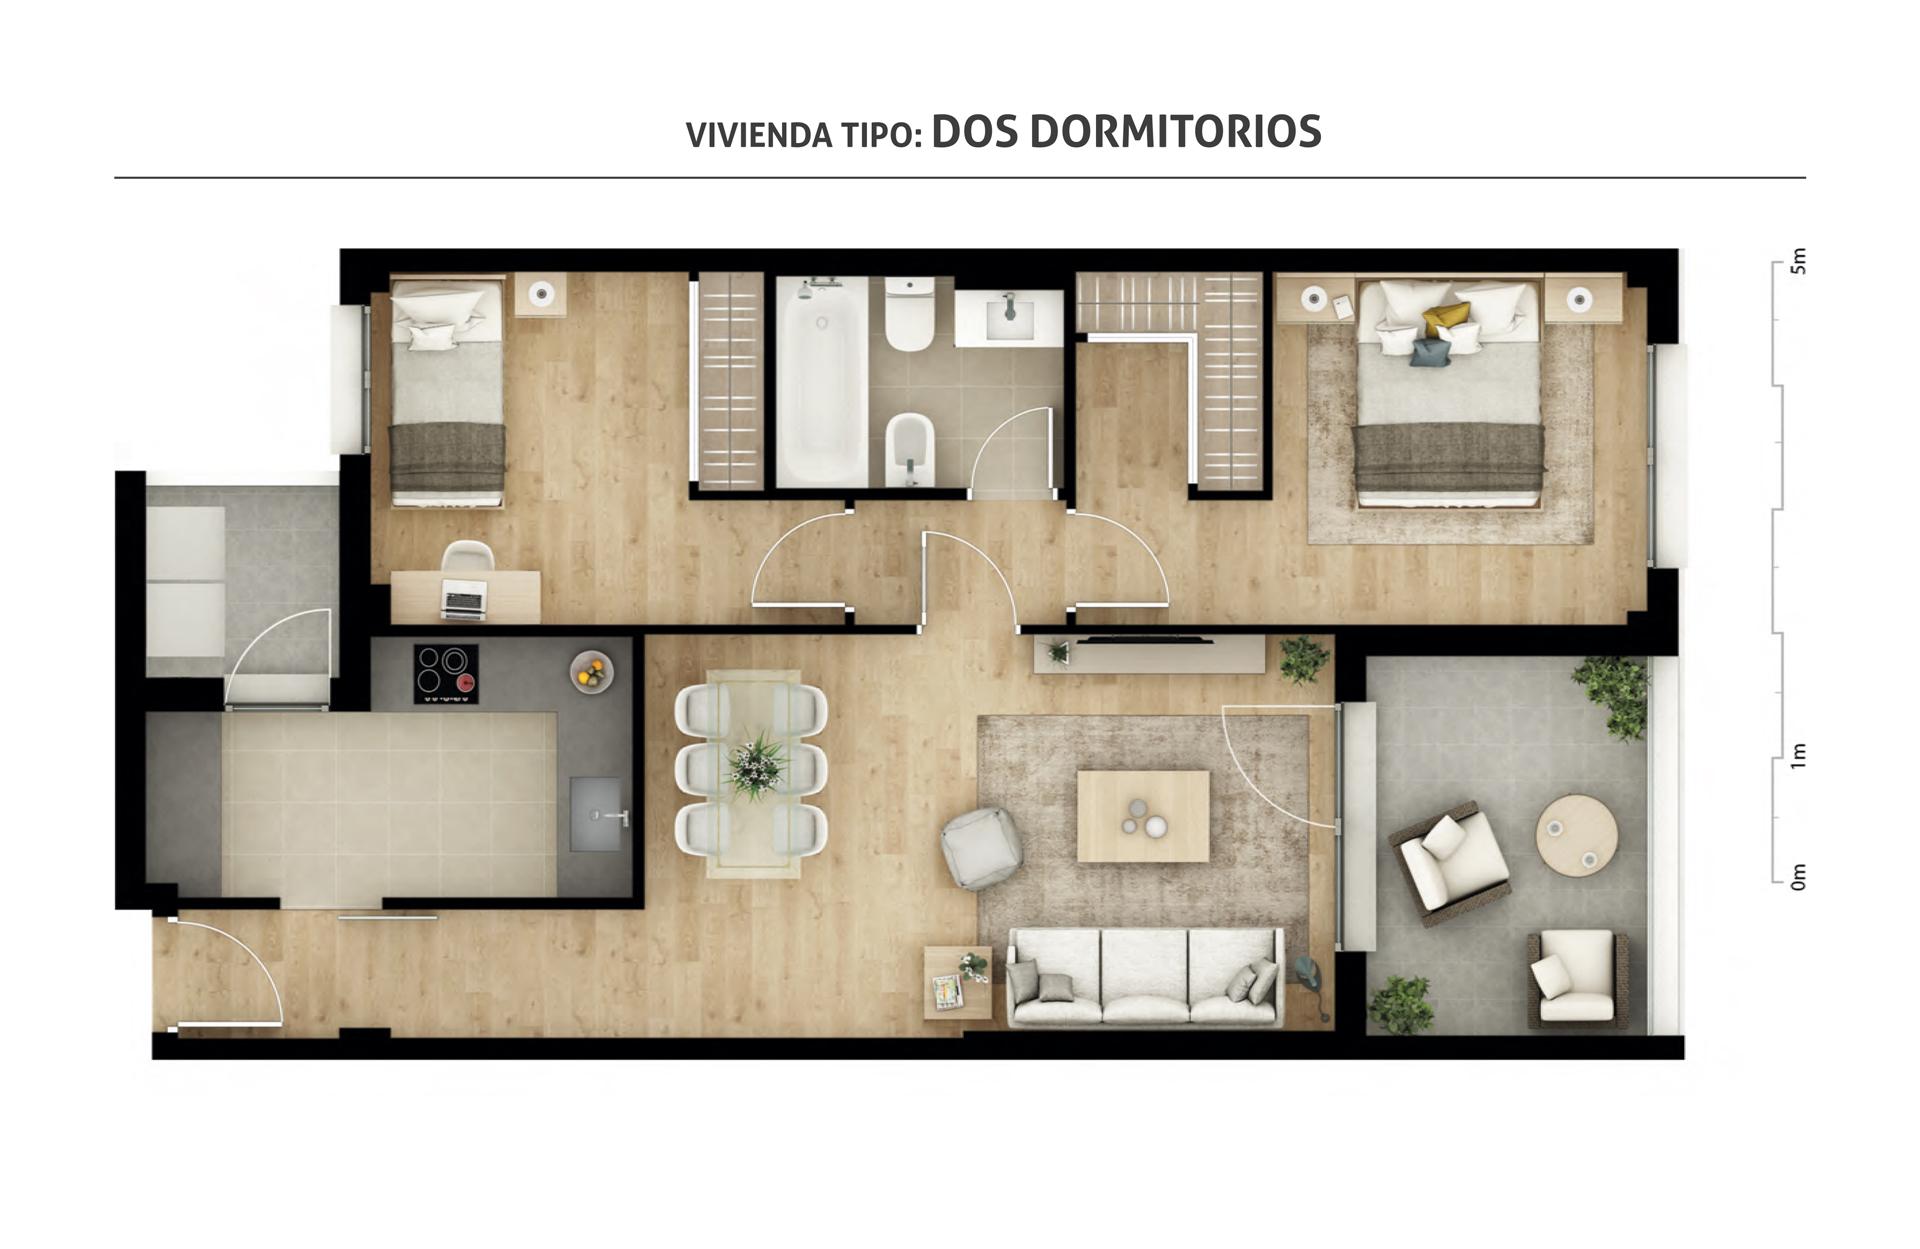 Viviendas tipo residencial plaza norte for Planos de viviendas de 2 dormitorios